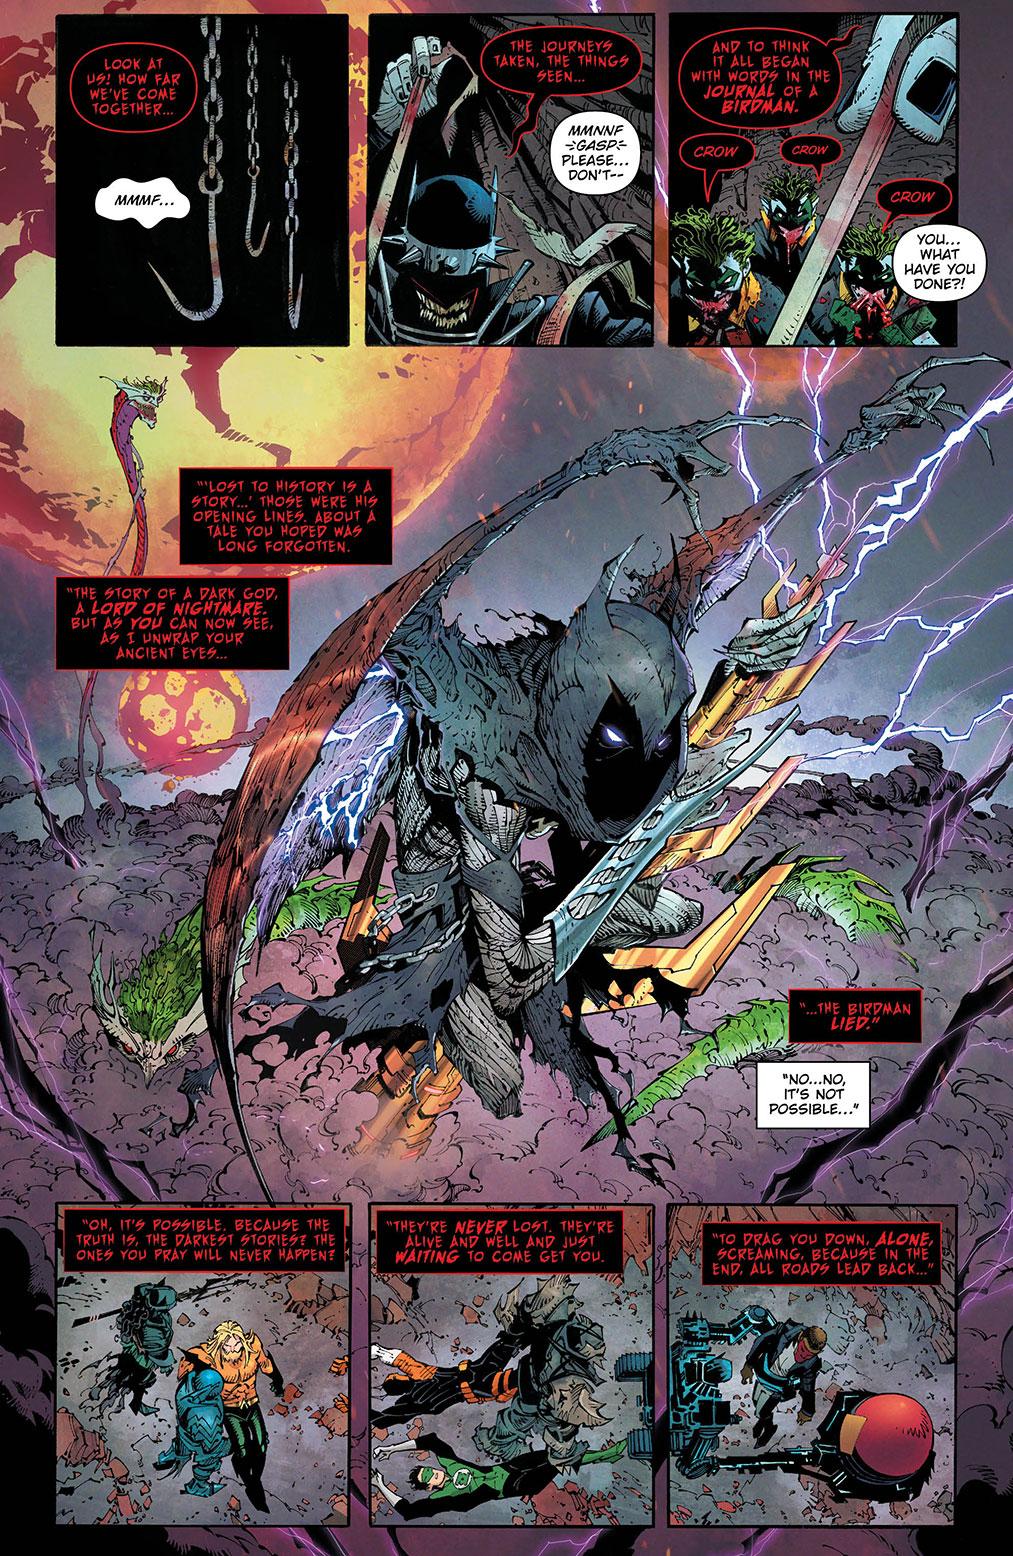 Dark Nights Metal 6_1 - DC Comics News